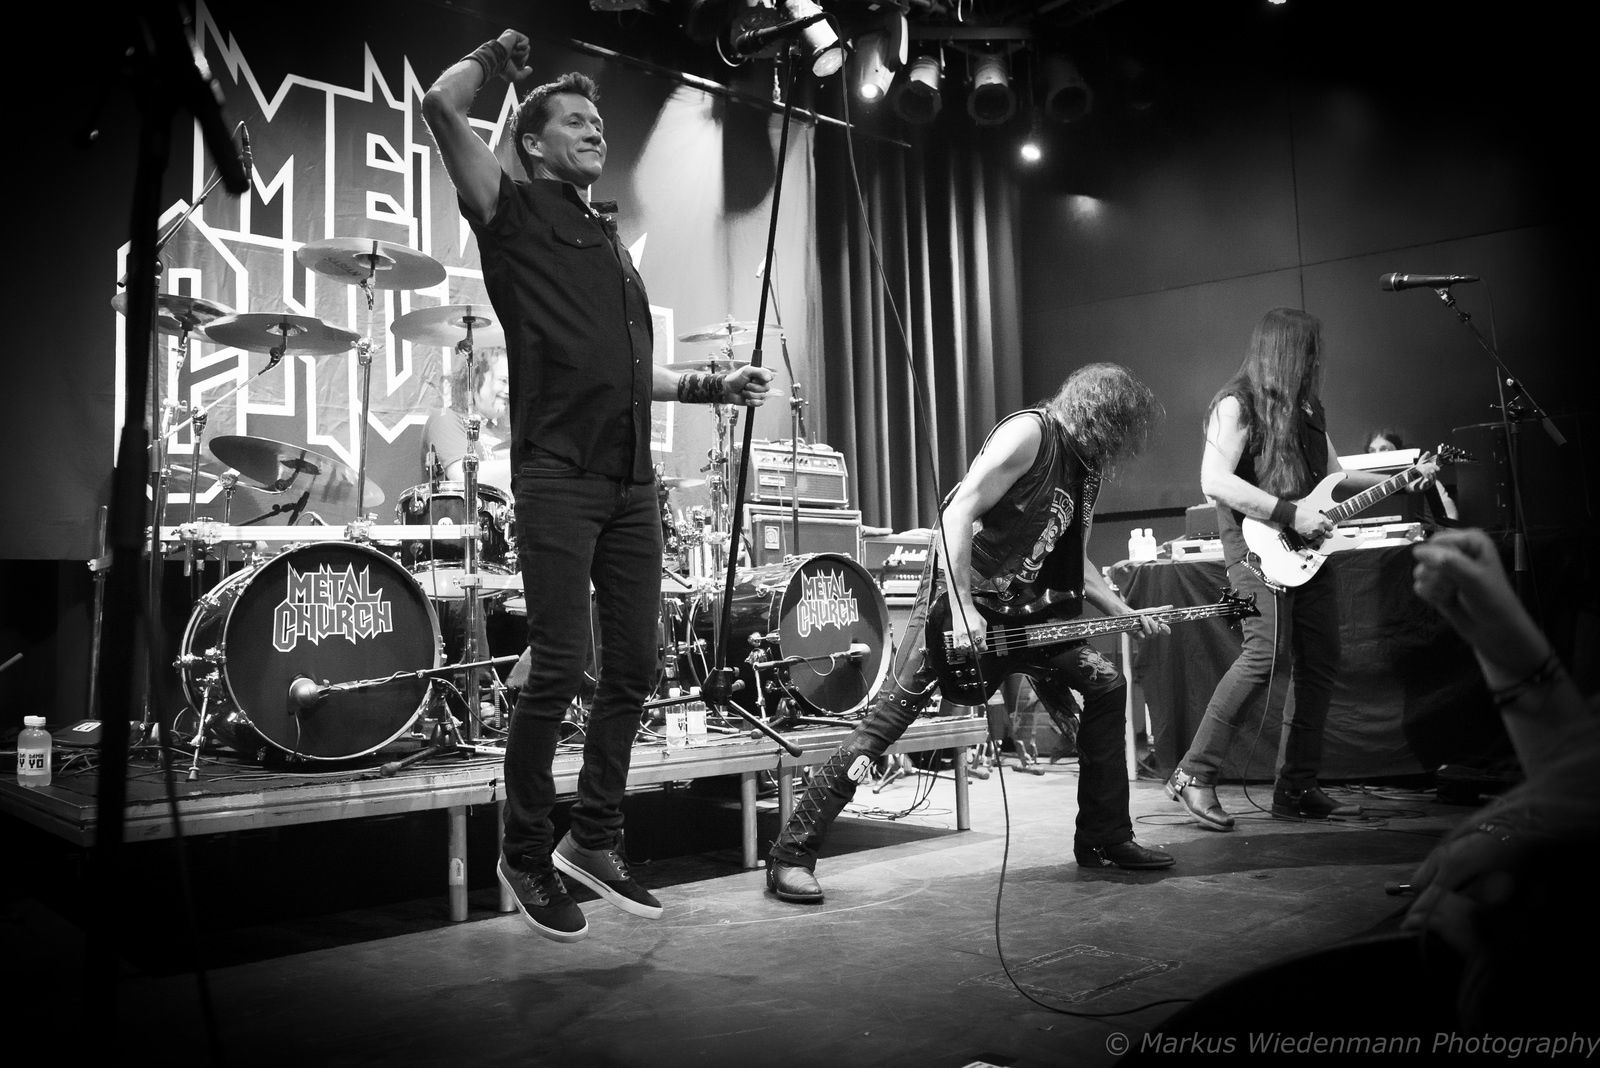 Live report METAL CHURCH / COMANIAC, Dynamo, Eindhoven, 11.06.2017